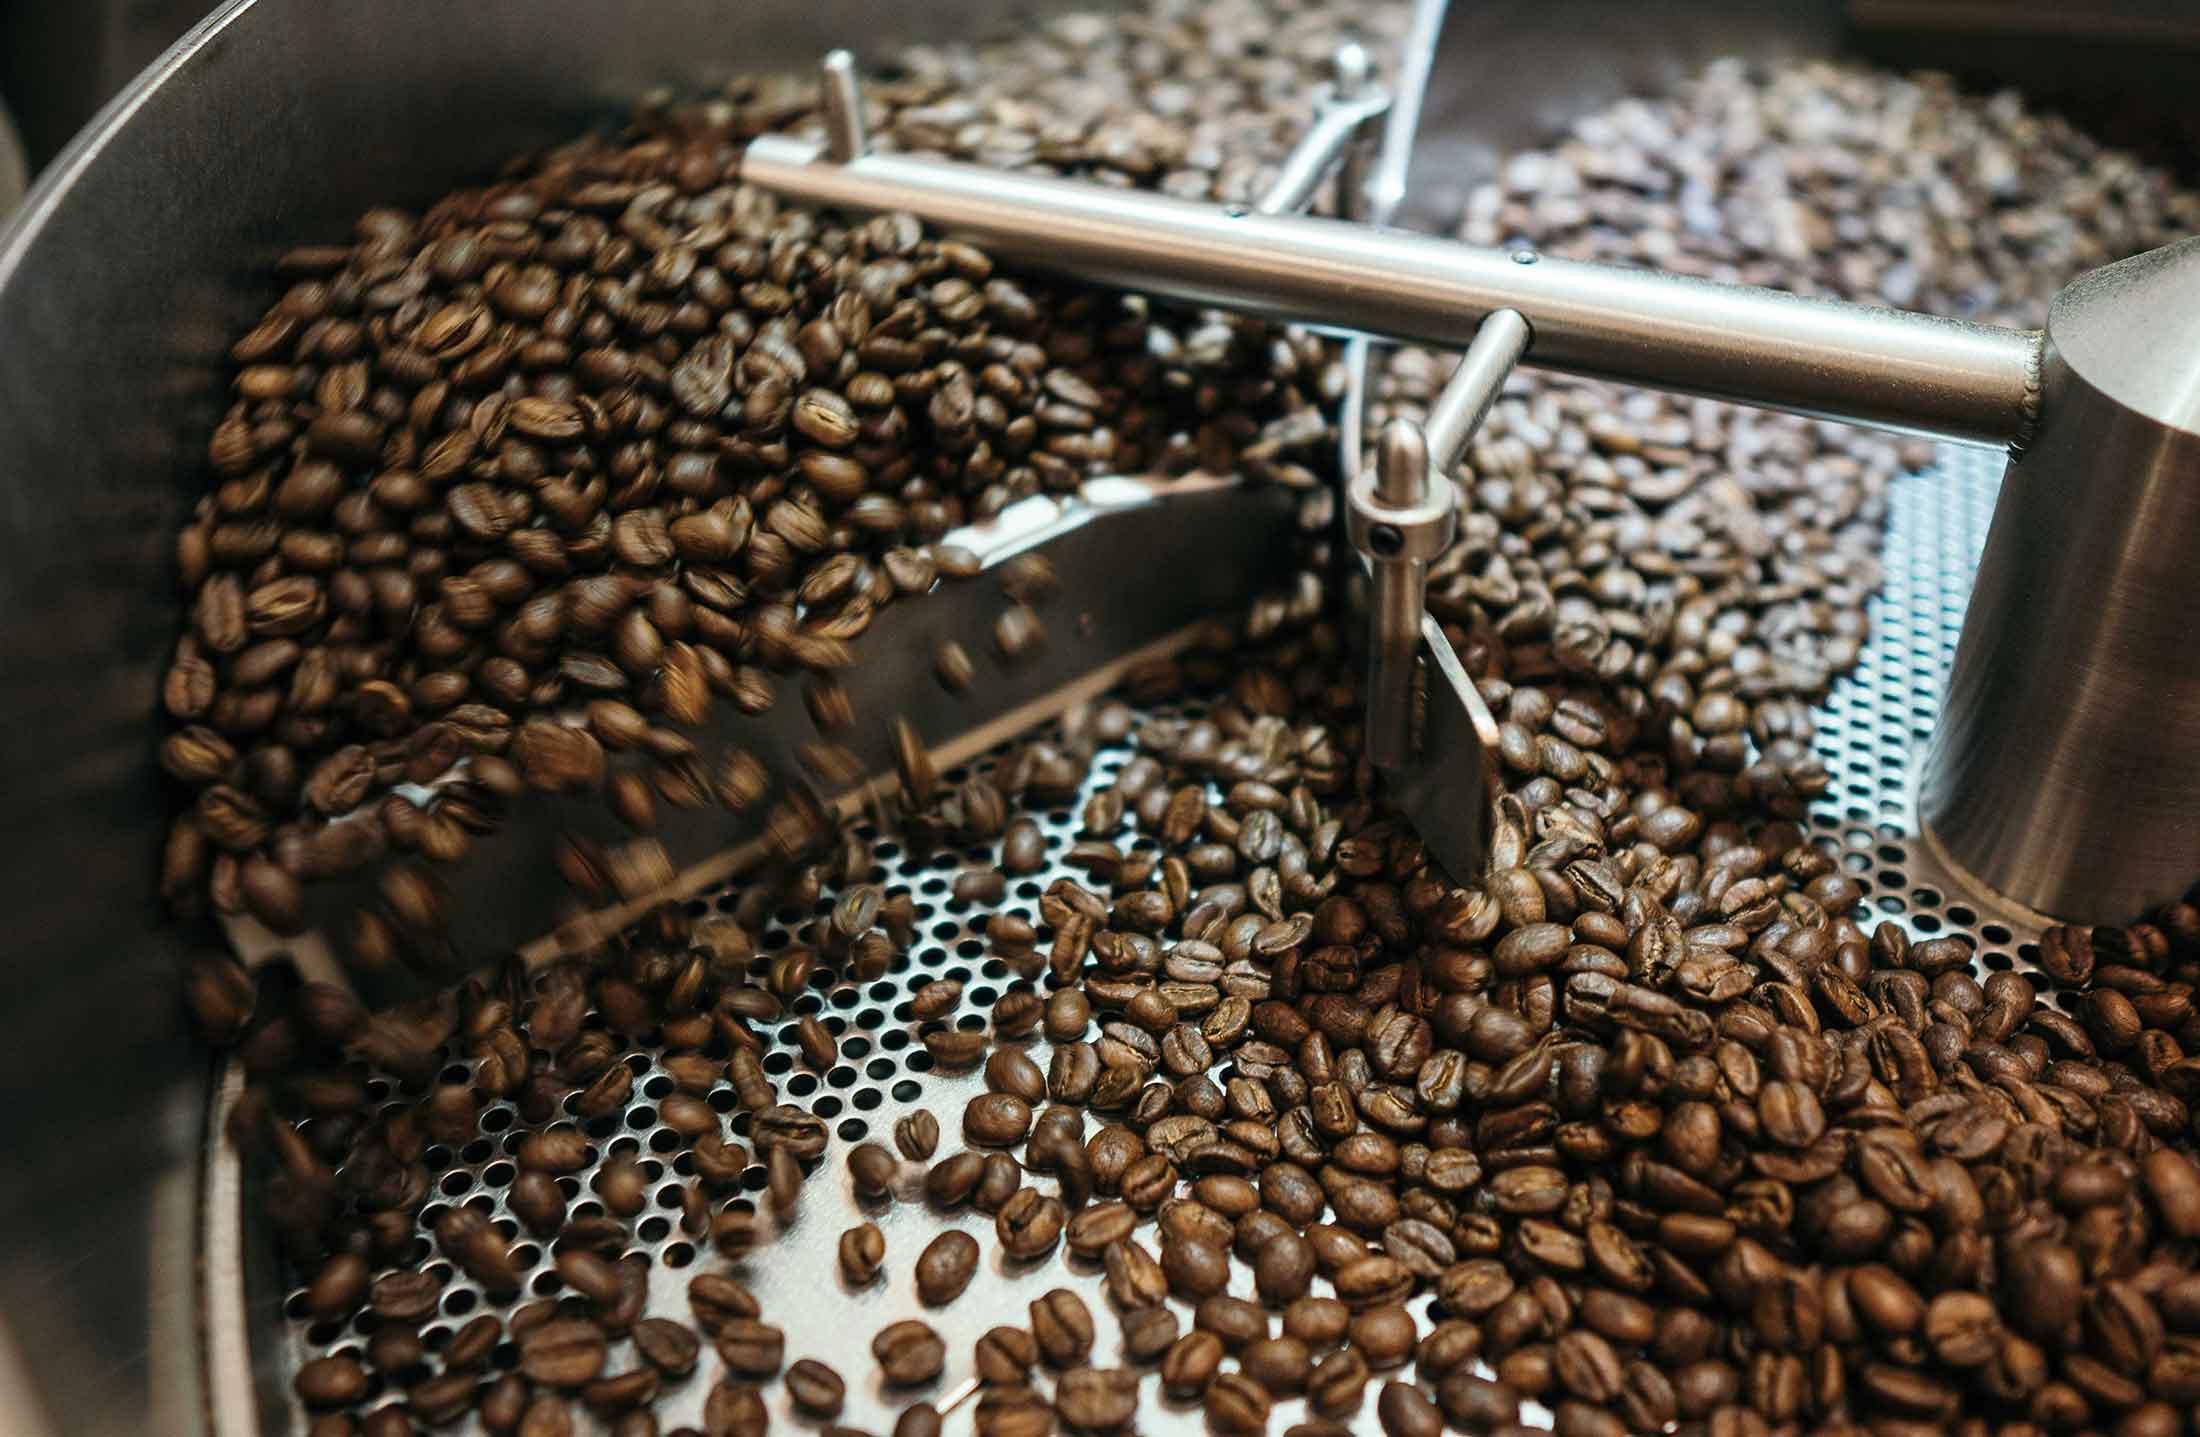 Kaffee Röstmaschine: Trommelröster